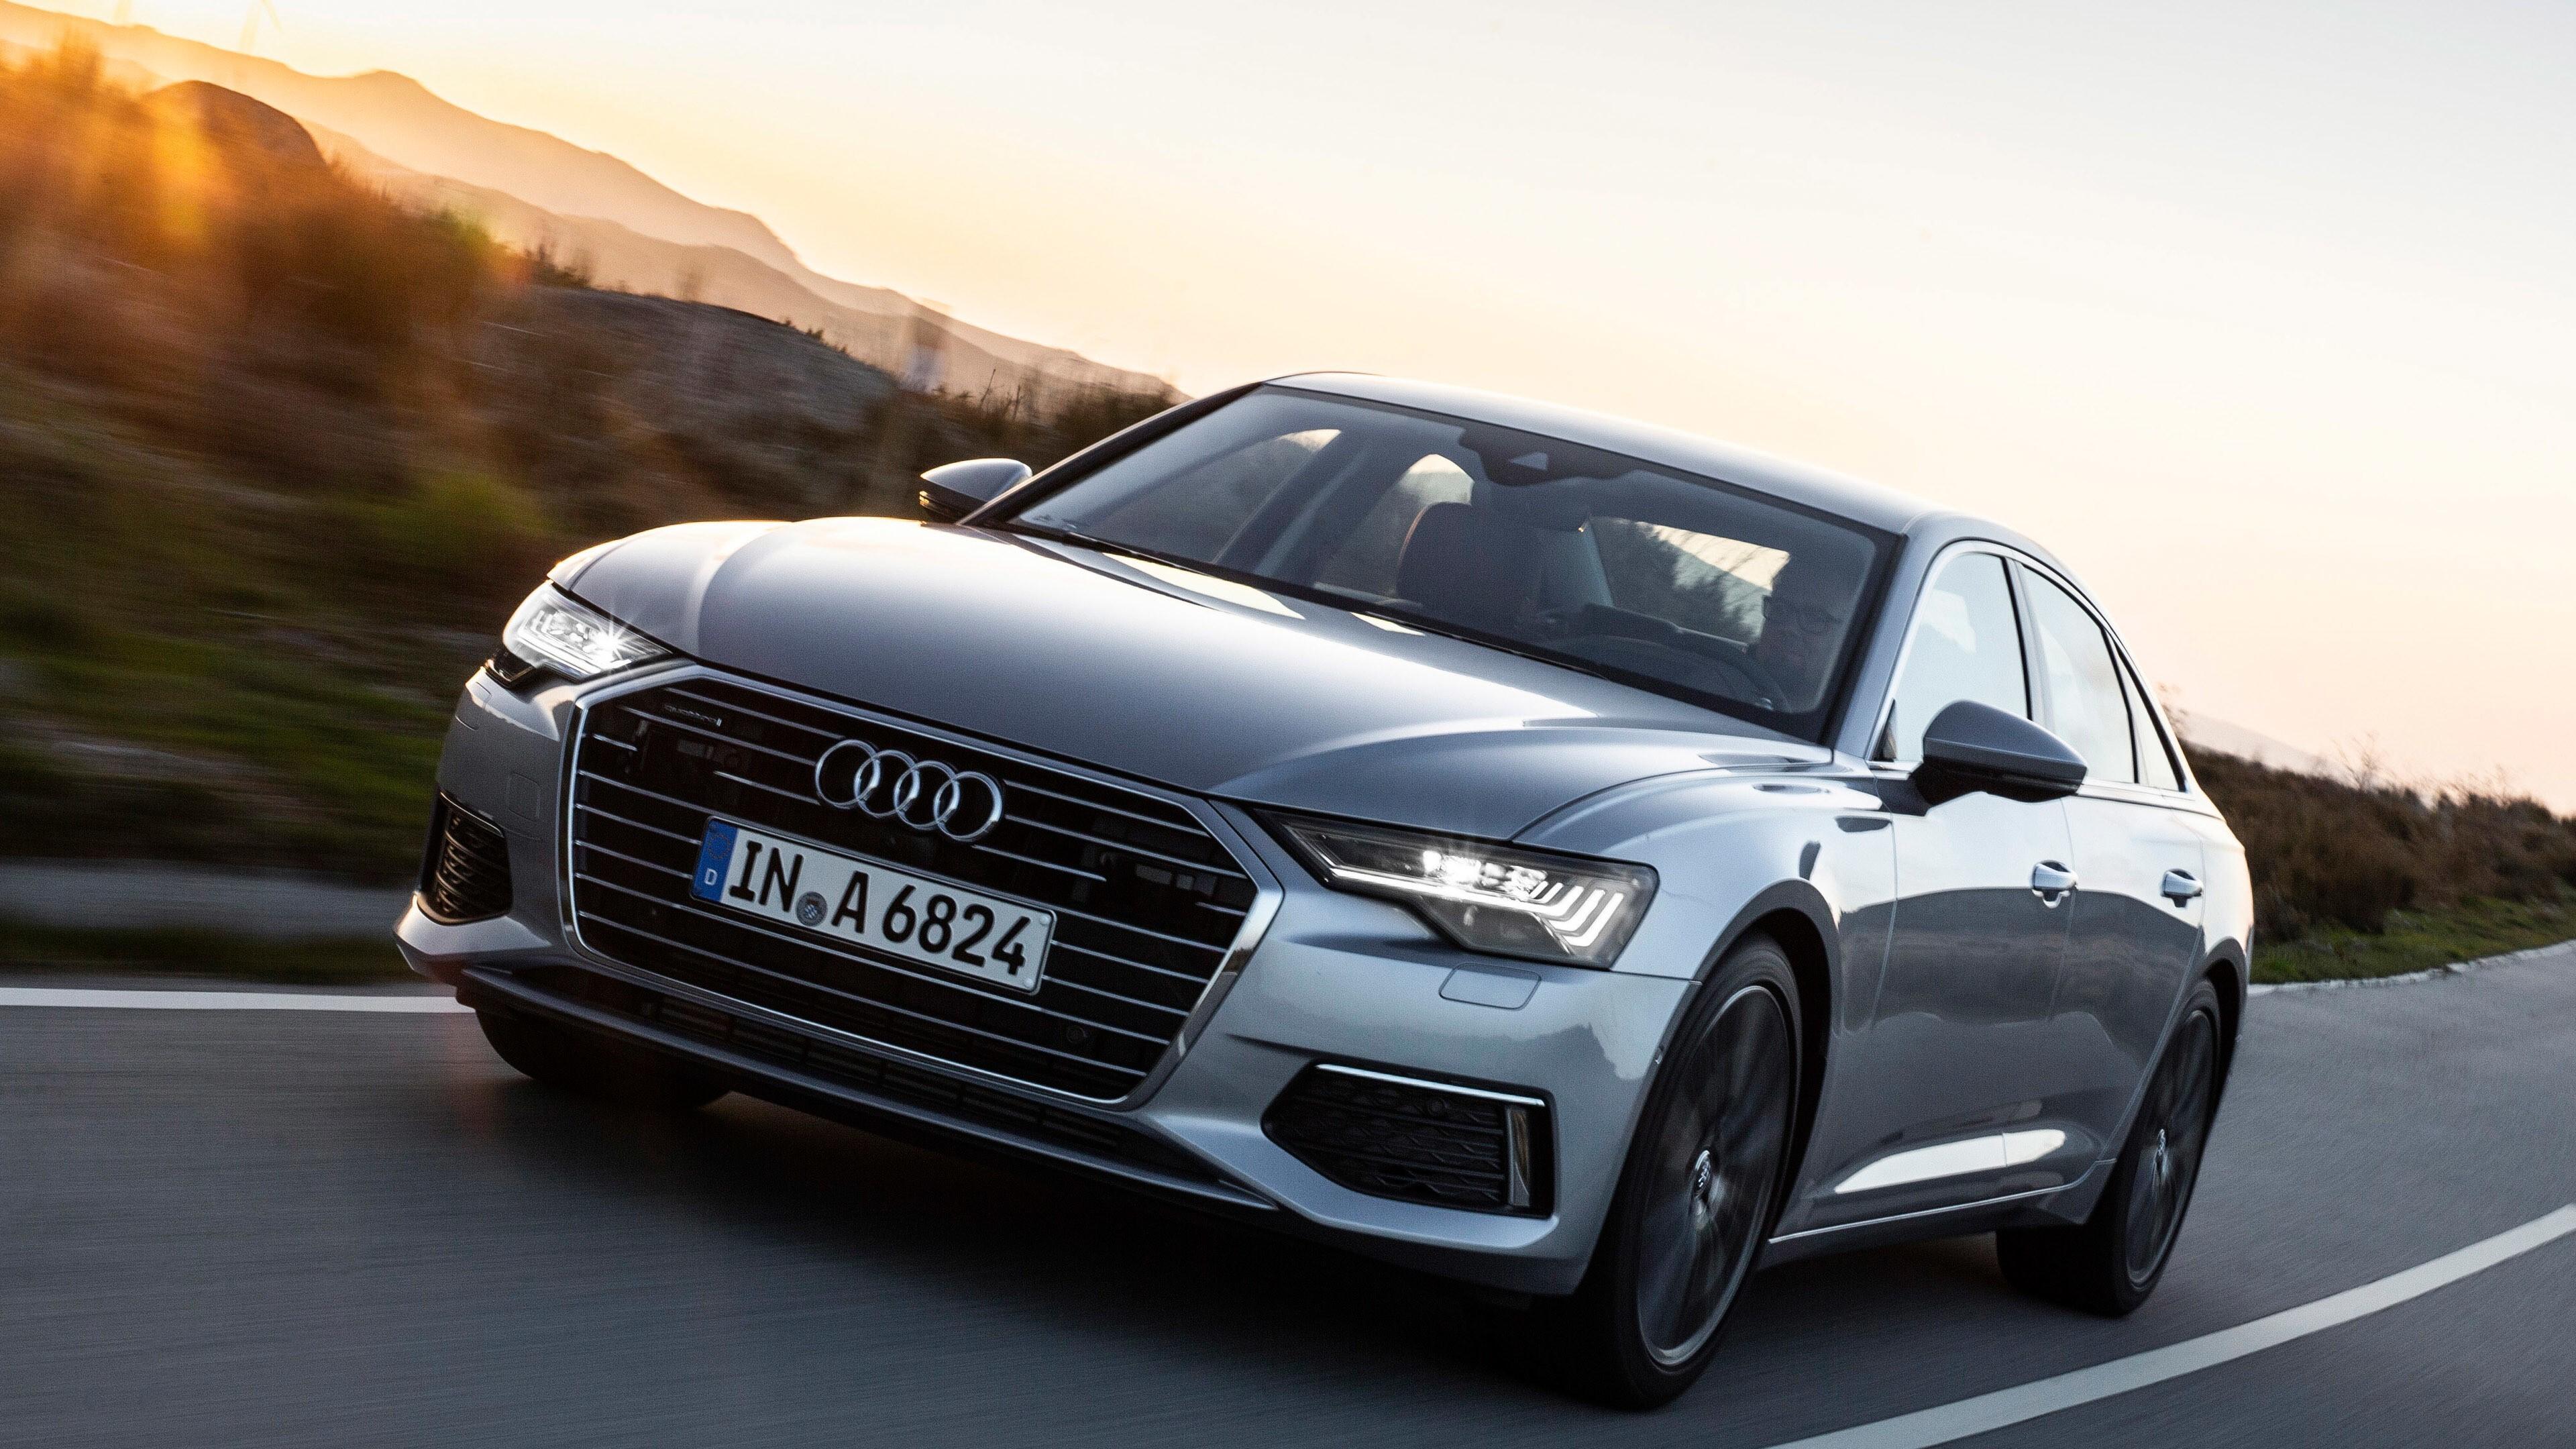 Audi A6 4k Car Hd Wallpapers